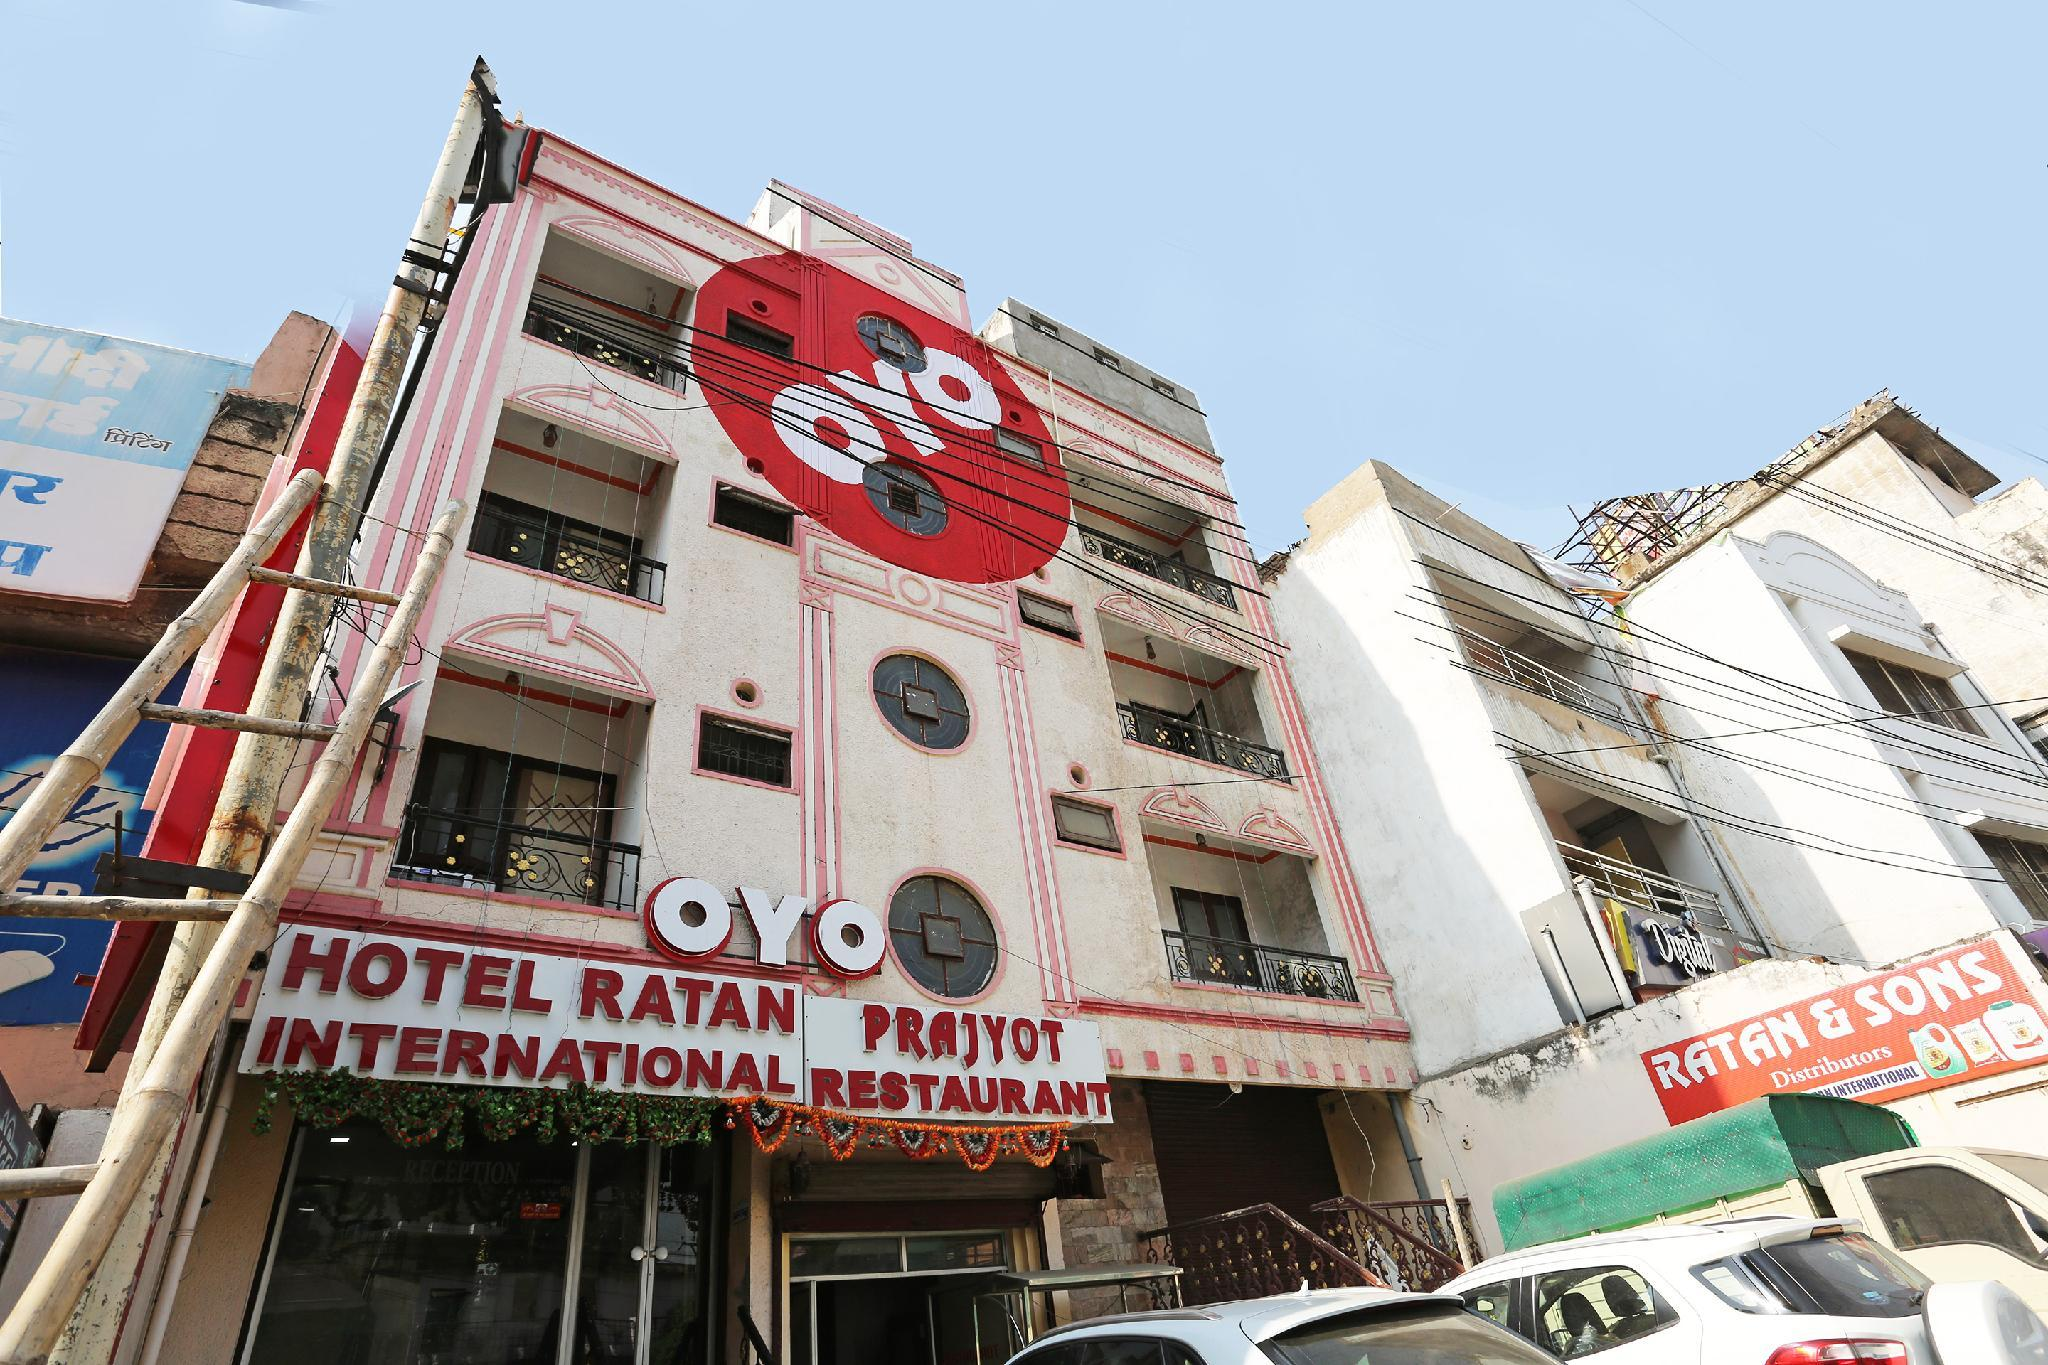 OYO 12363 Hotel Ratan International